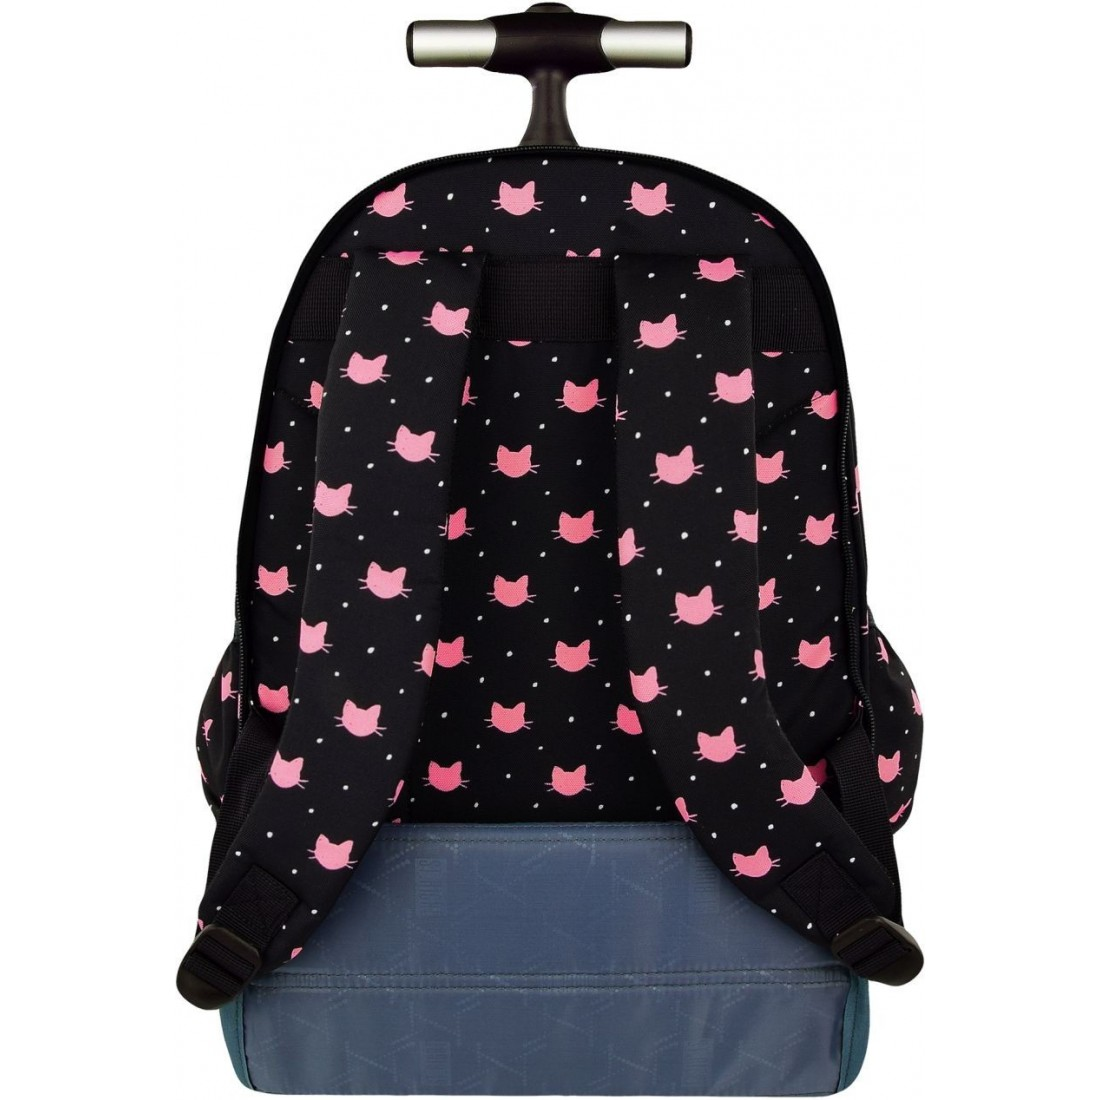 92c3cd347d11d Plecak na kółkach ST.RIGHT MEOW różowe koty dla dziewczyn HIT 2018 ...